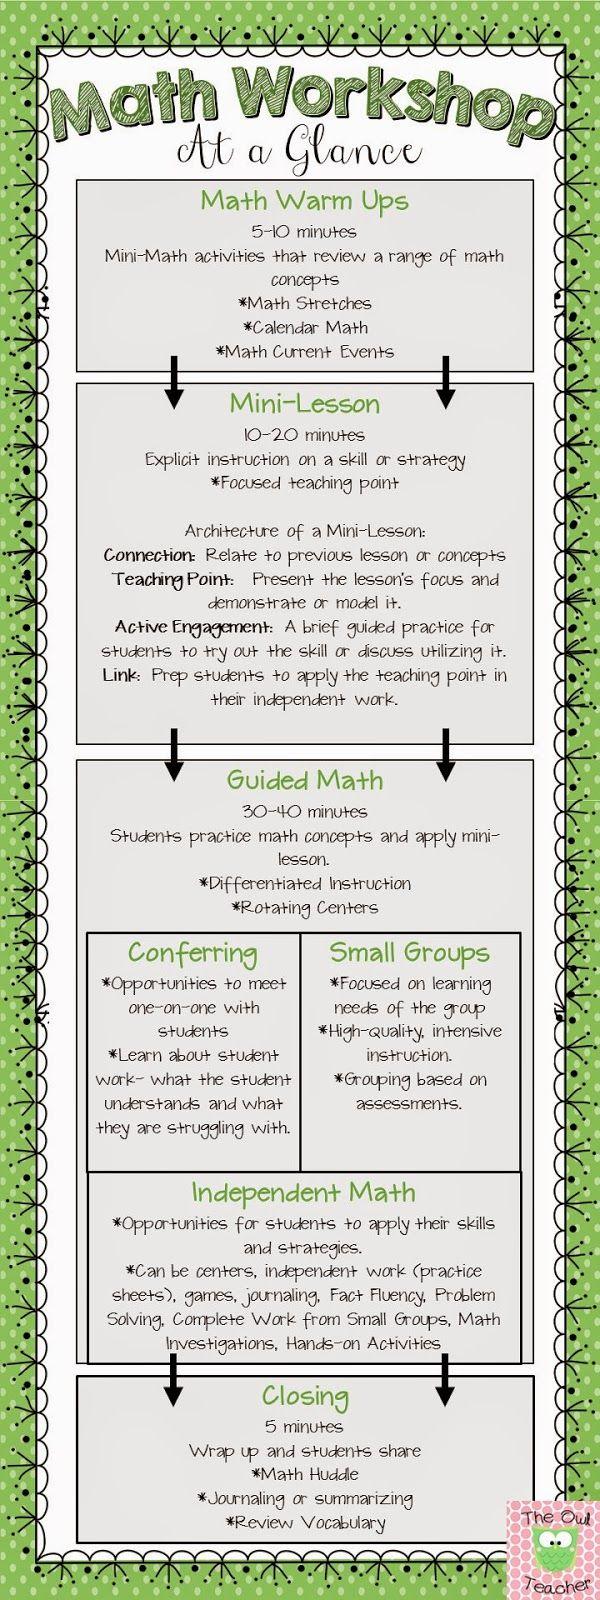 Math Workshop Week 3